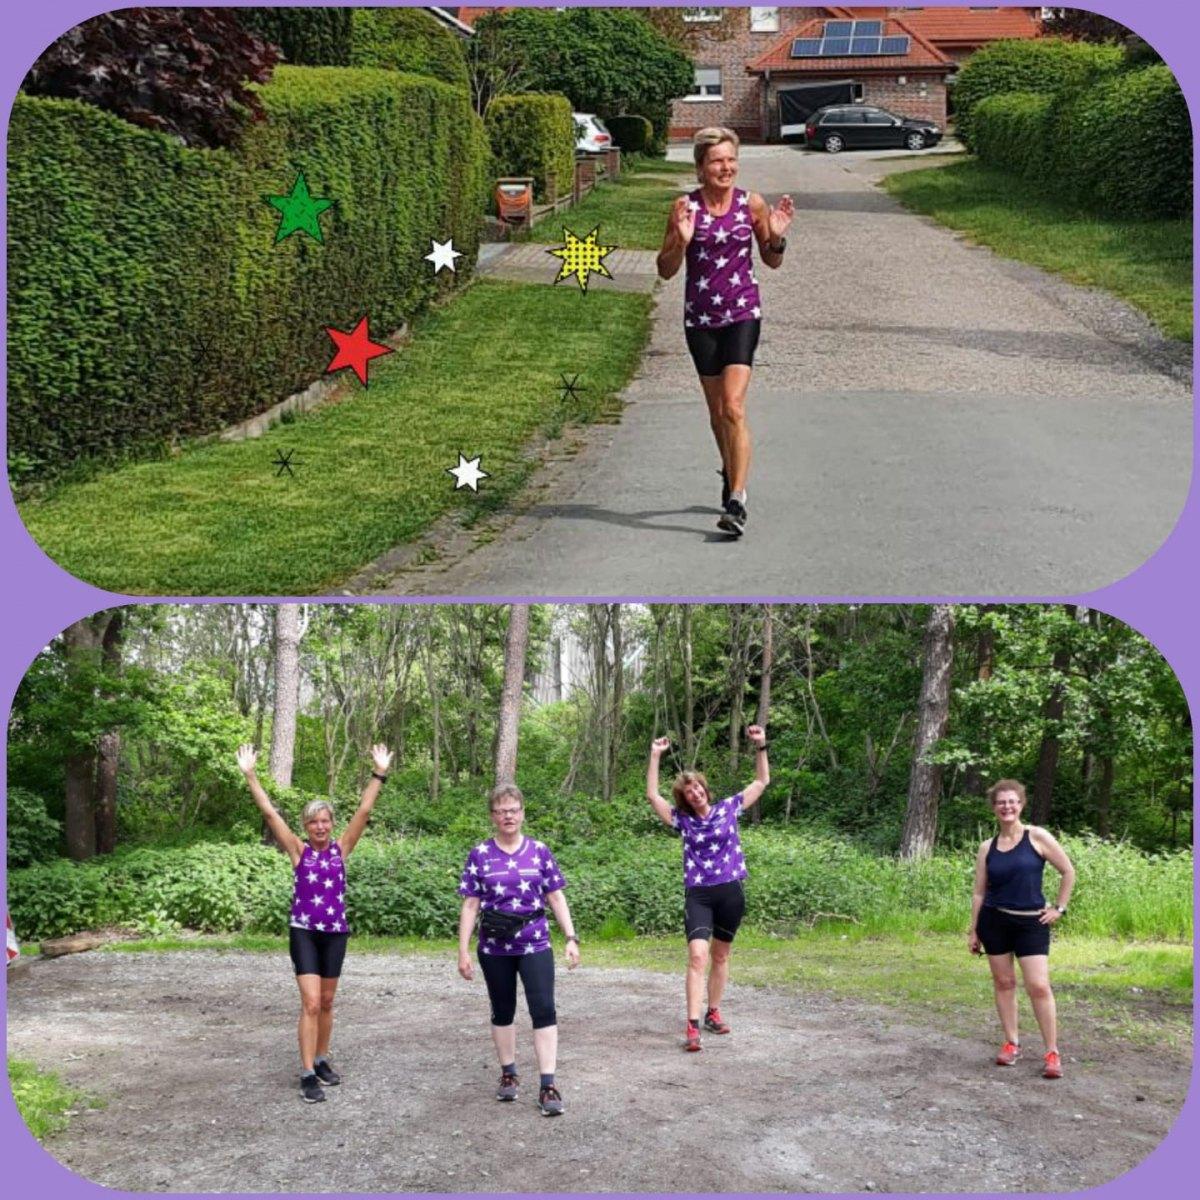 Kruse-Manuela-21-Challenge-Sternchenlauf-oT7l7